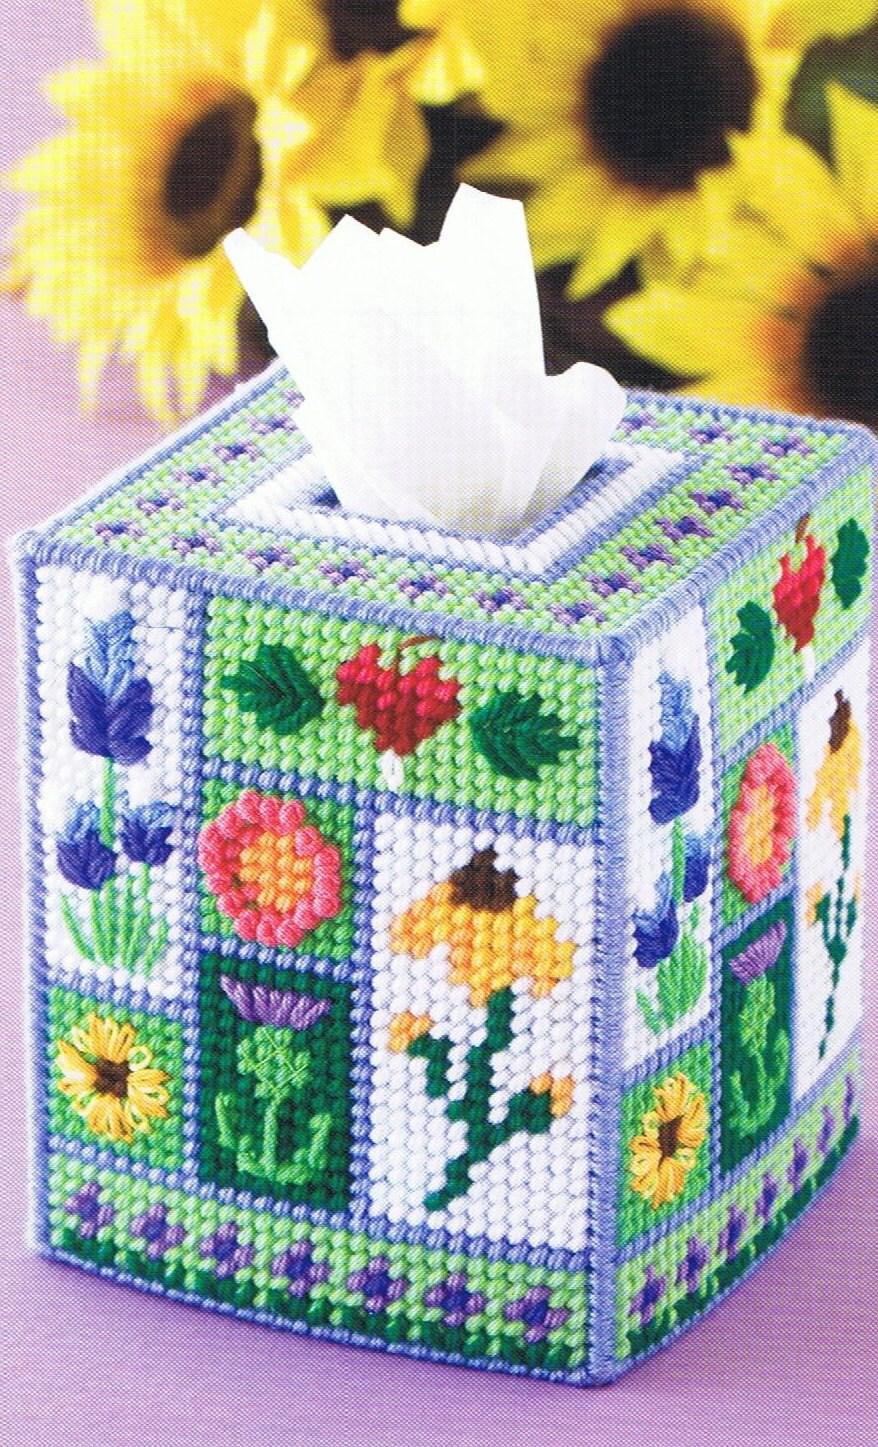 Wildflowers Amp Slice Of Watermelon Plastic Canvas Tissue